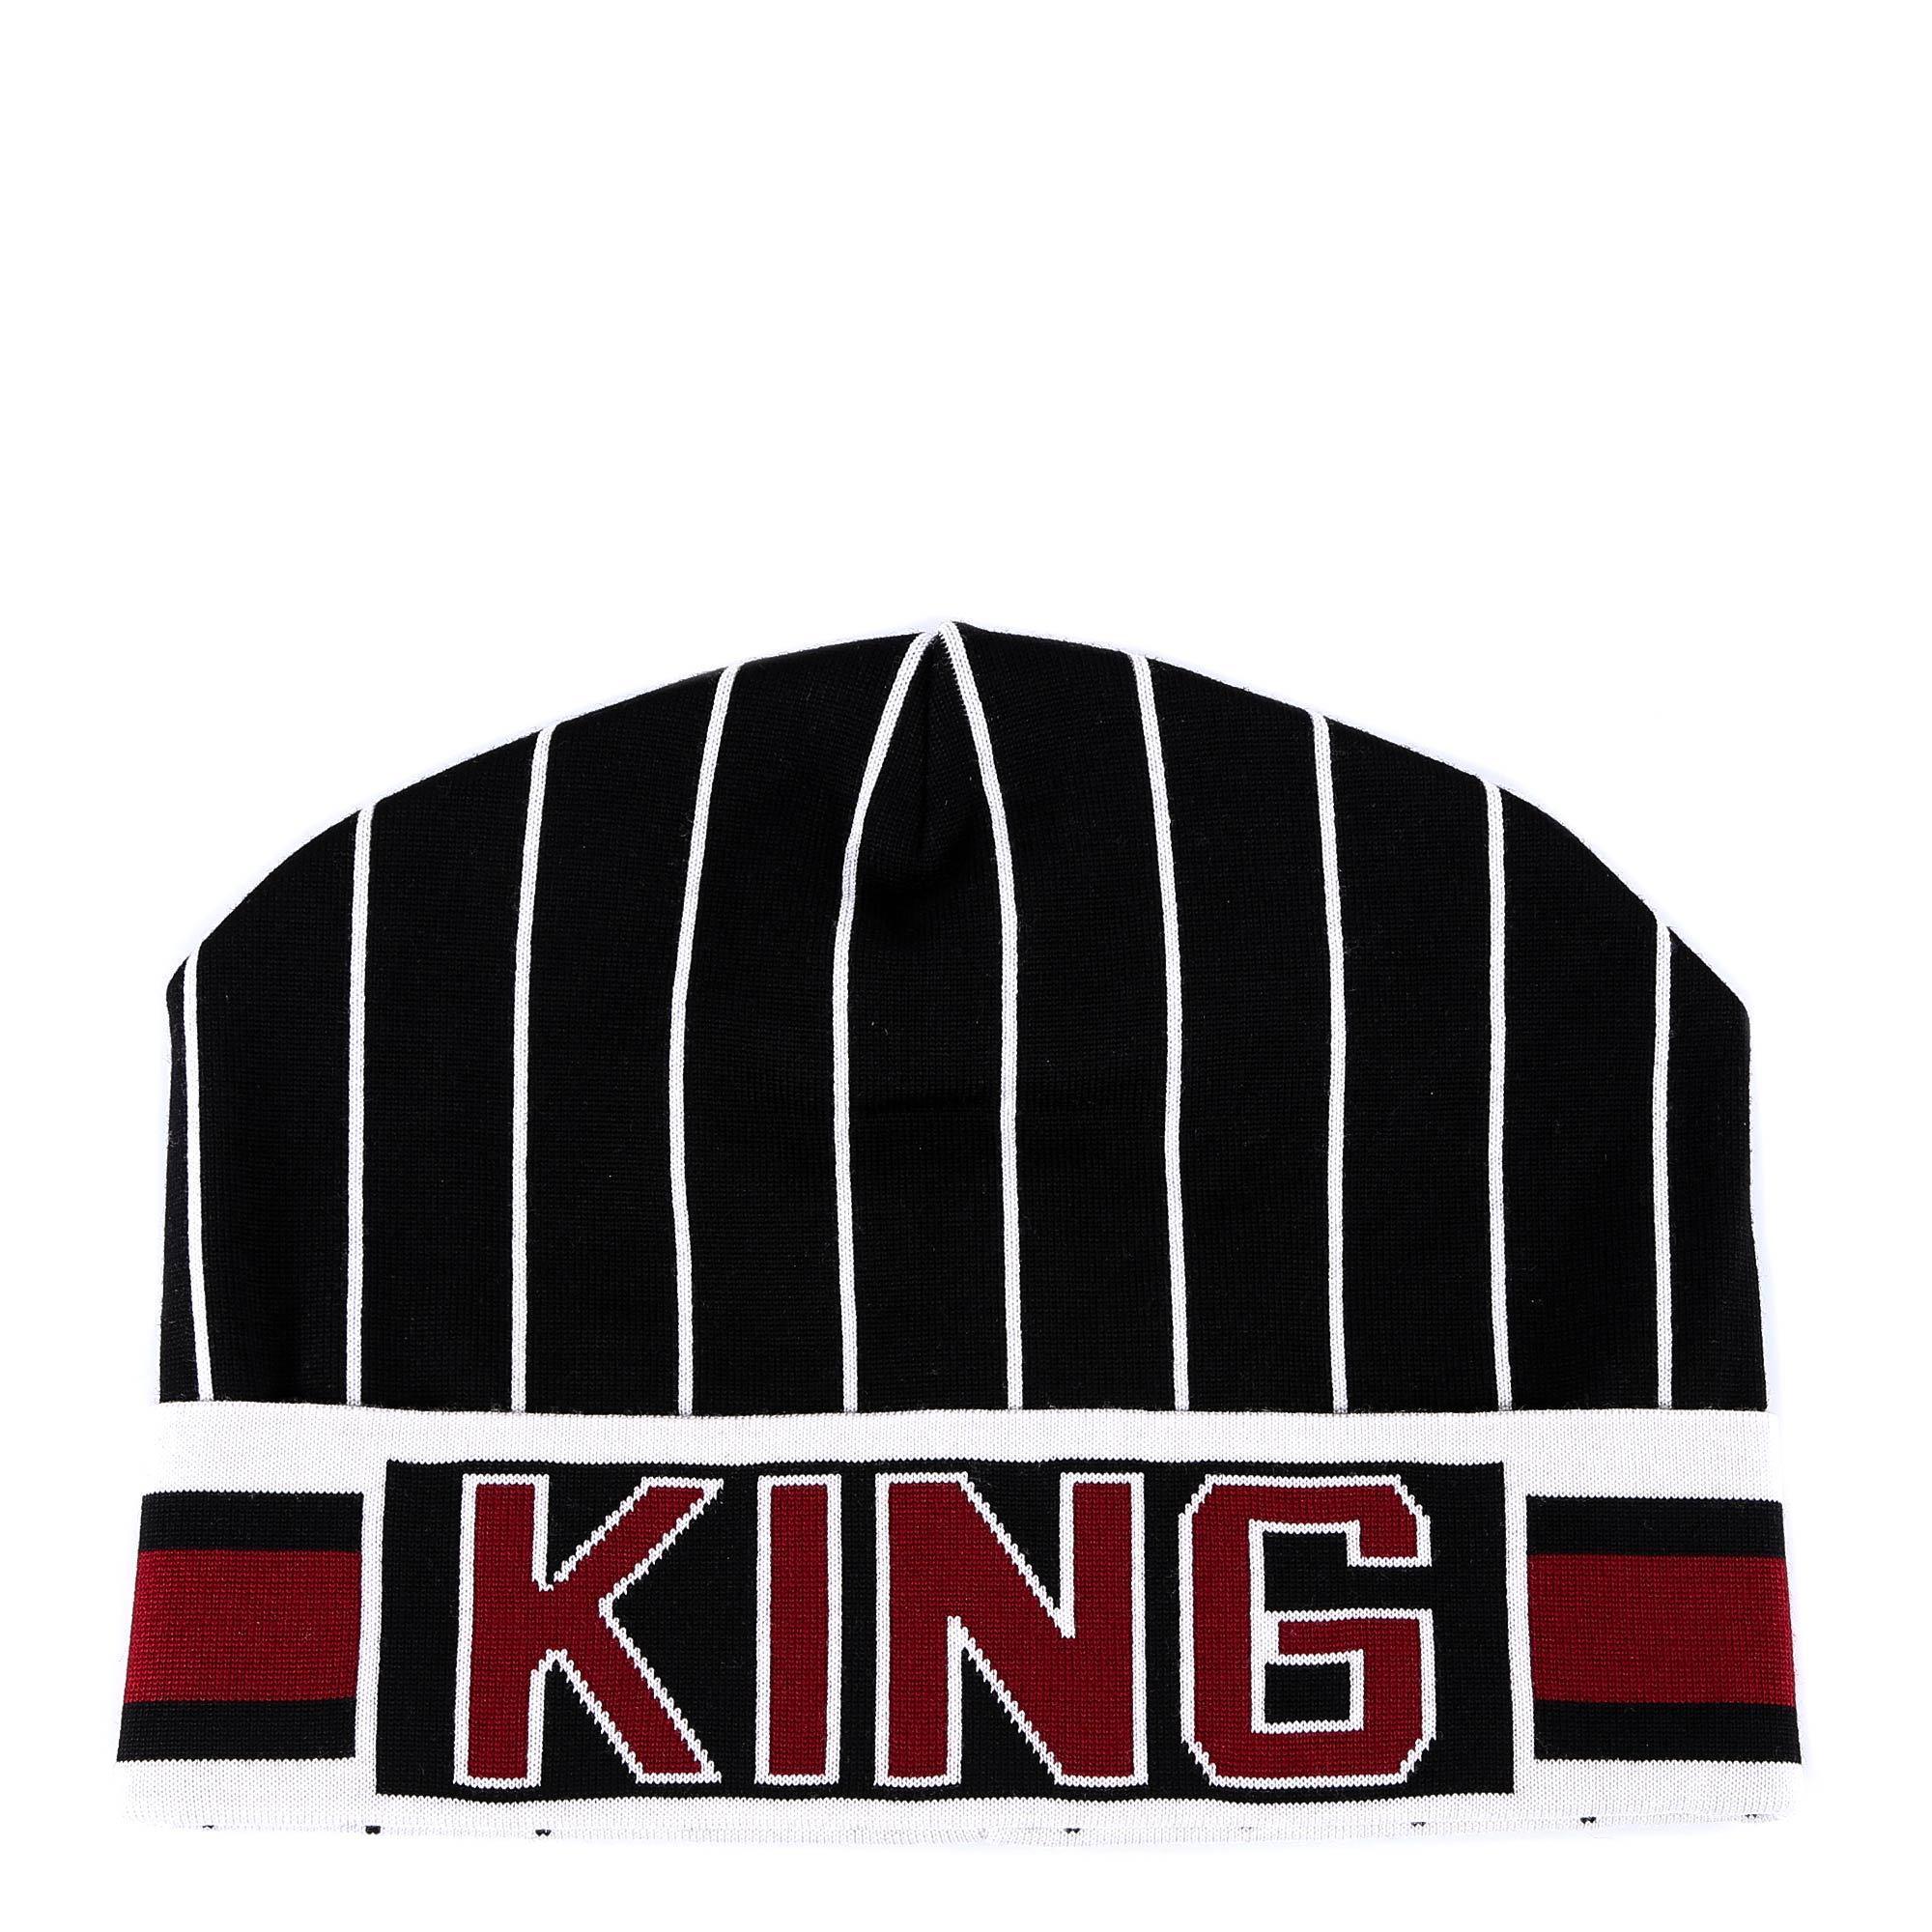 840bfd58c34 Lyst - Dolce   Gabbana King Beanie in Black for Men